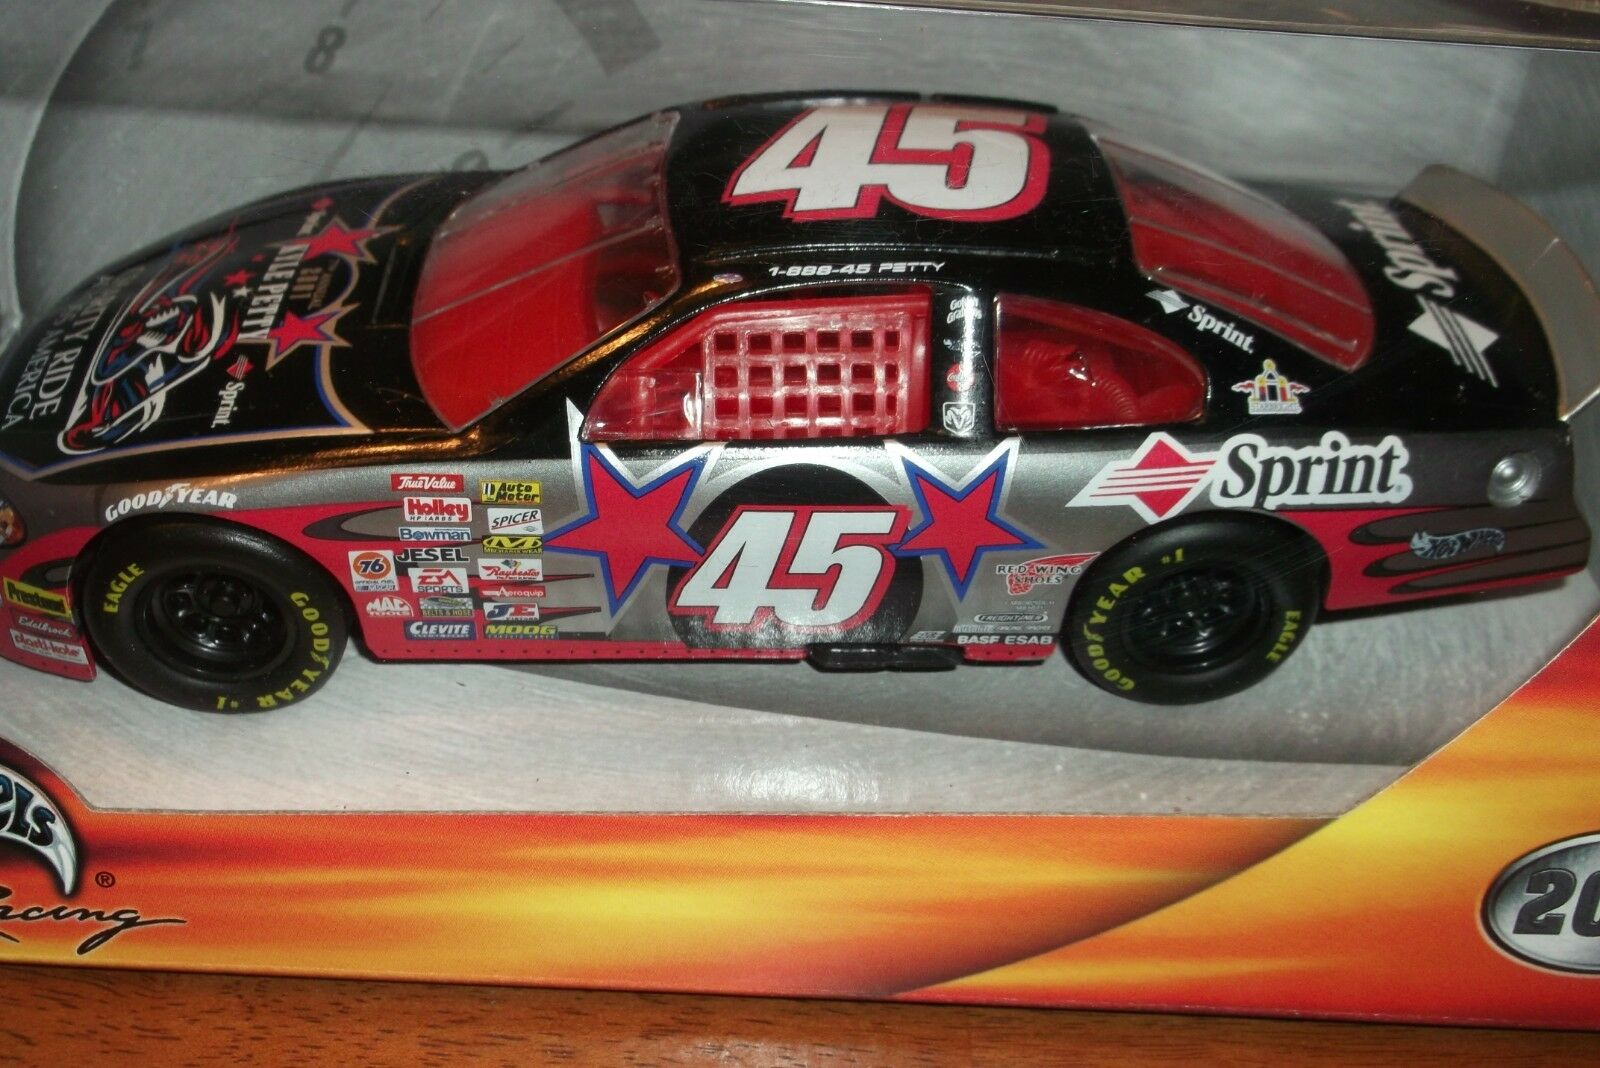 KYLE PETTY CHARITY RIDE SPRINT NASCAR HOT HOT HOT WHEELS RACING 2001 1 24 SCALE (57) 494e68